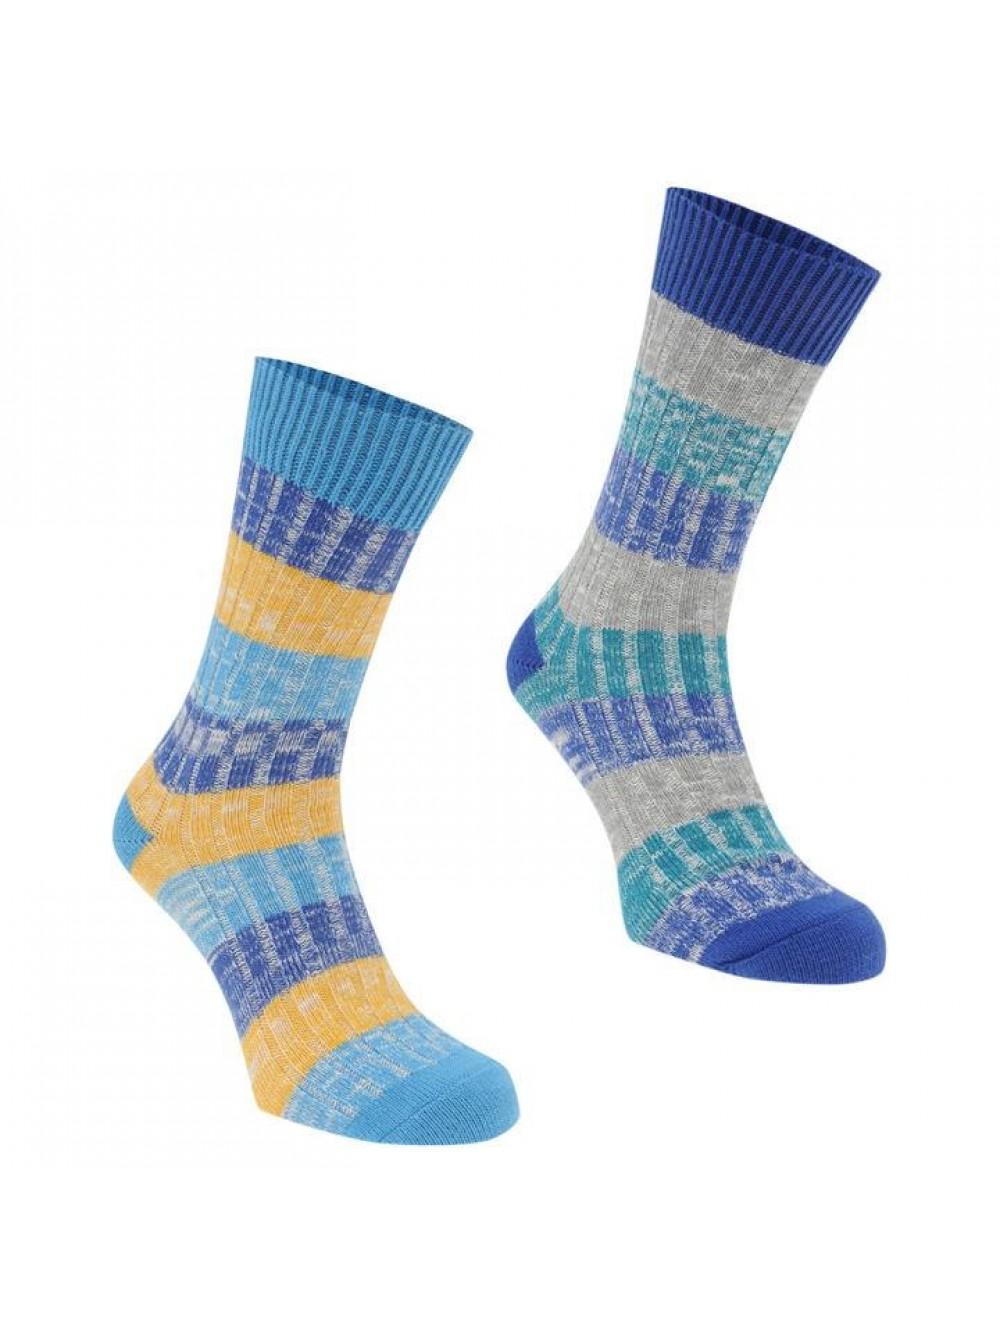 Nevica Ski Socks - Лижні шкарпетки купити в Києві 963daa0166faa